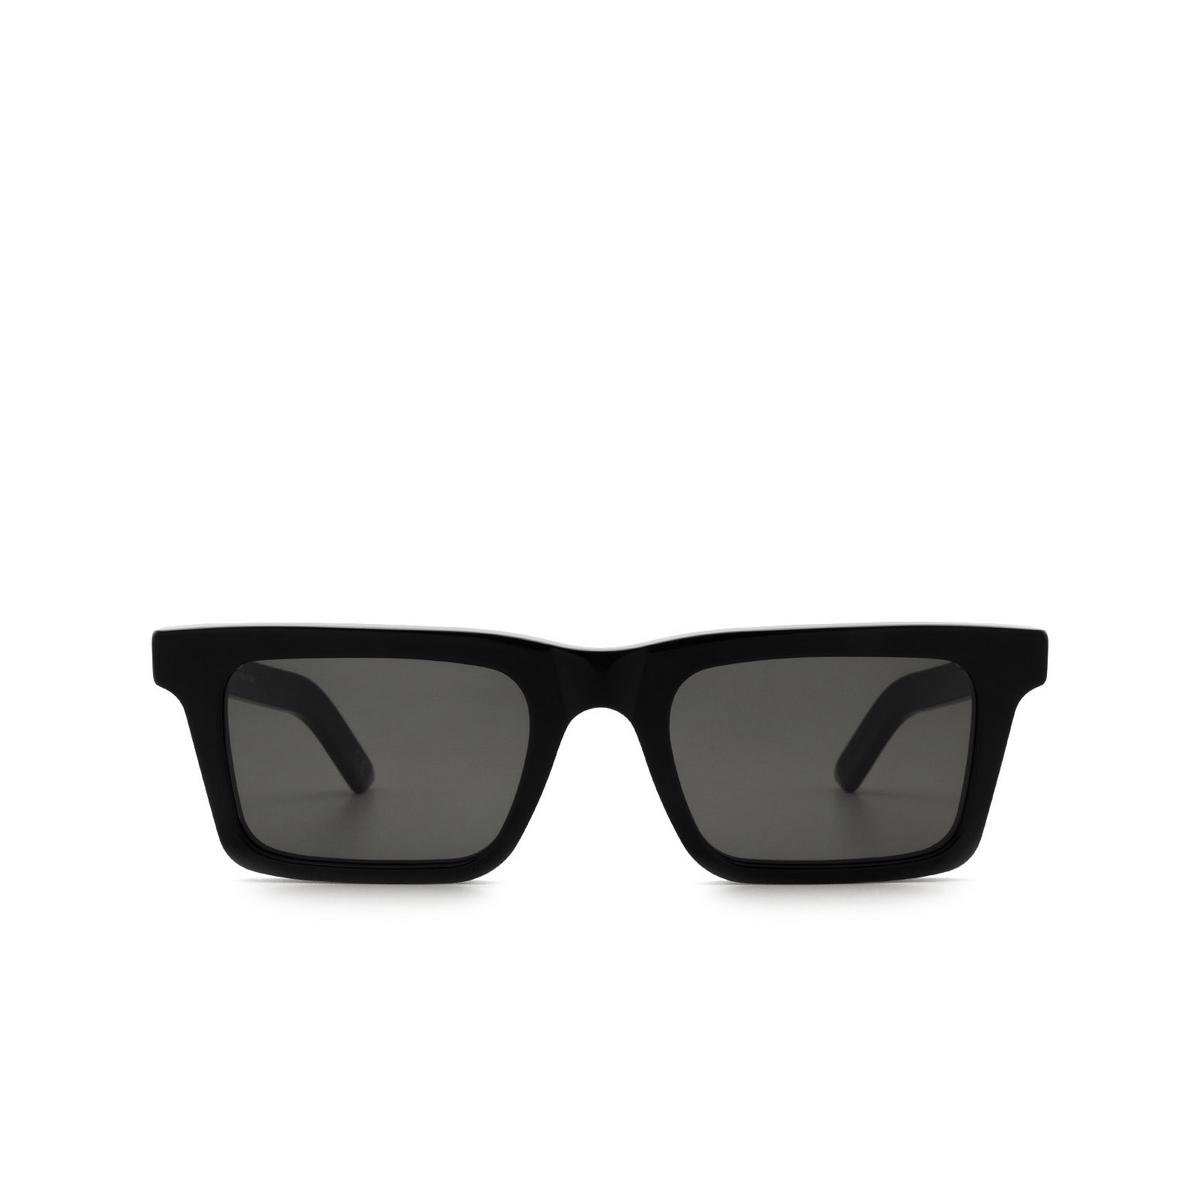 Retrosuperfuture® Rectangle Sunglasses: 1968 color Black UU1 - front view.